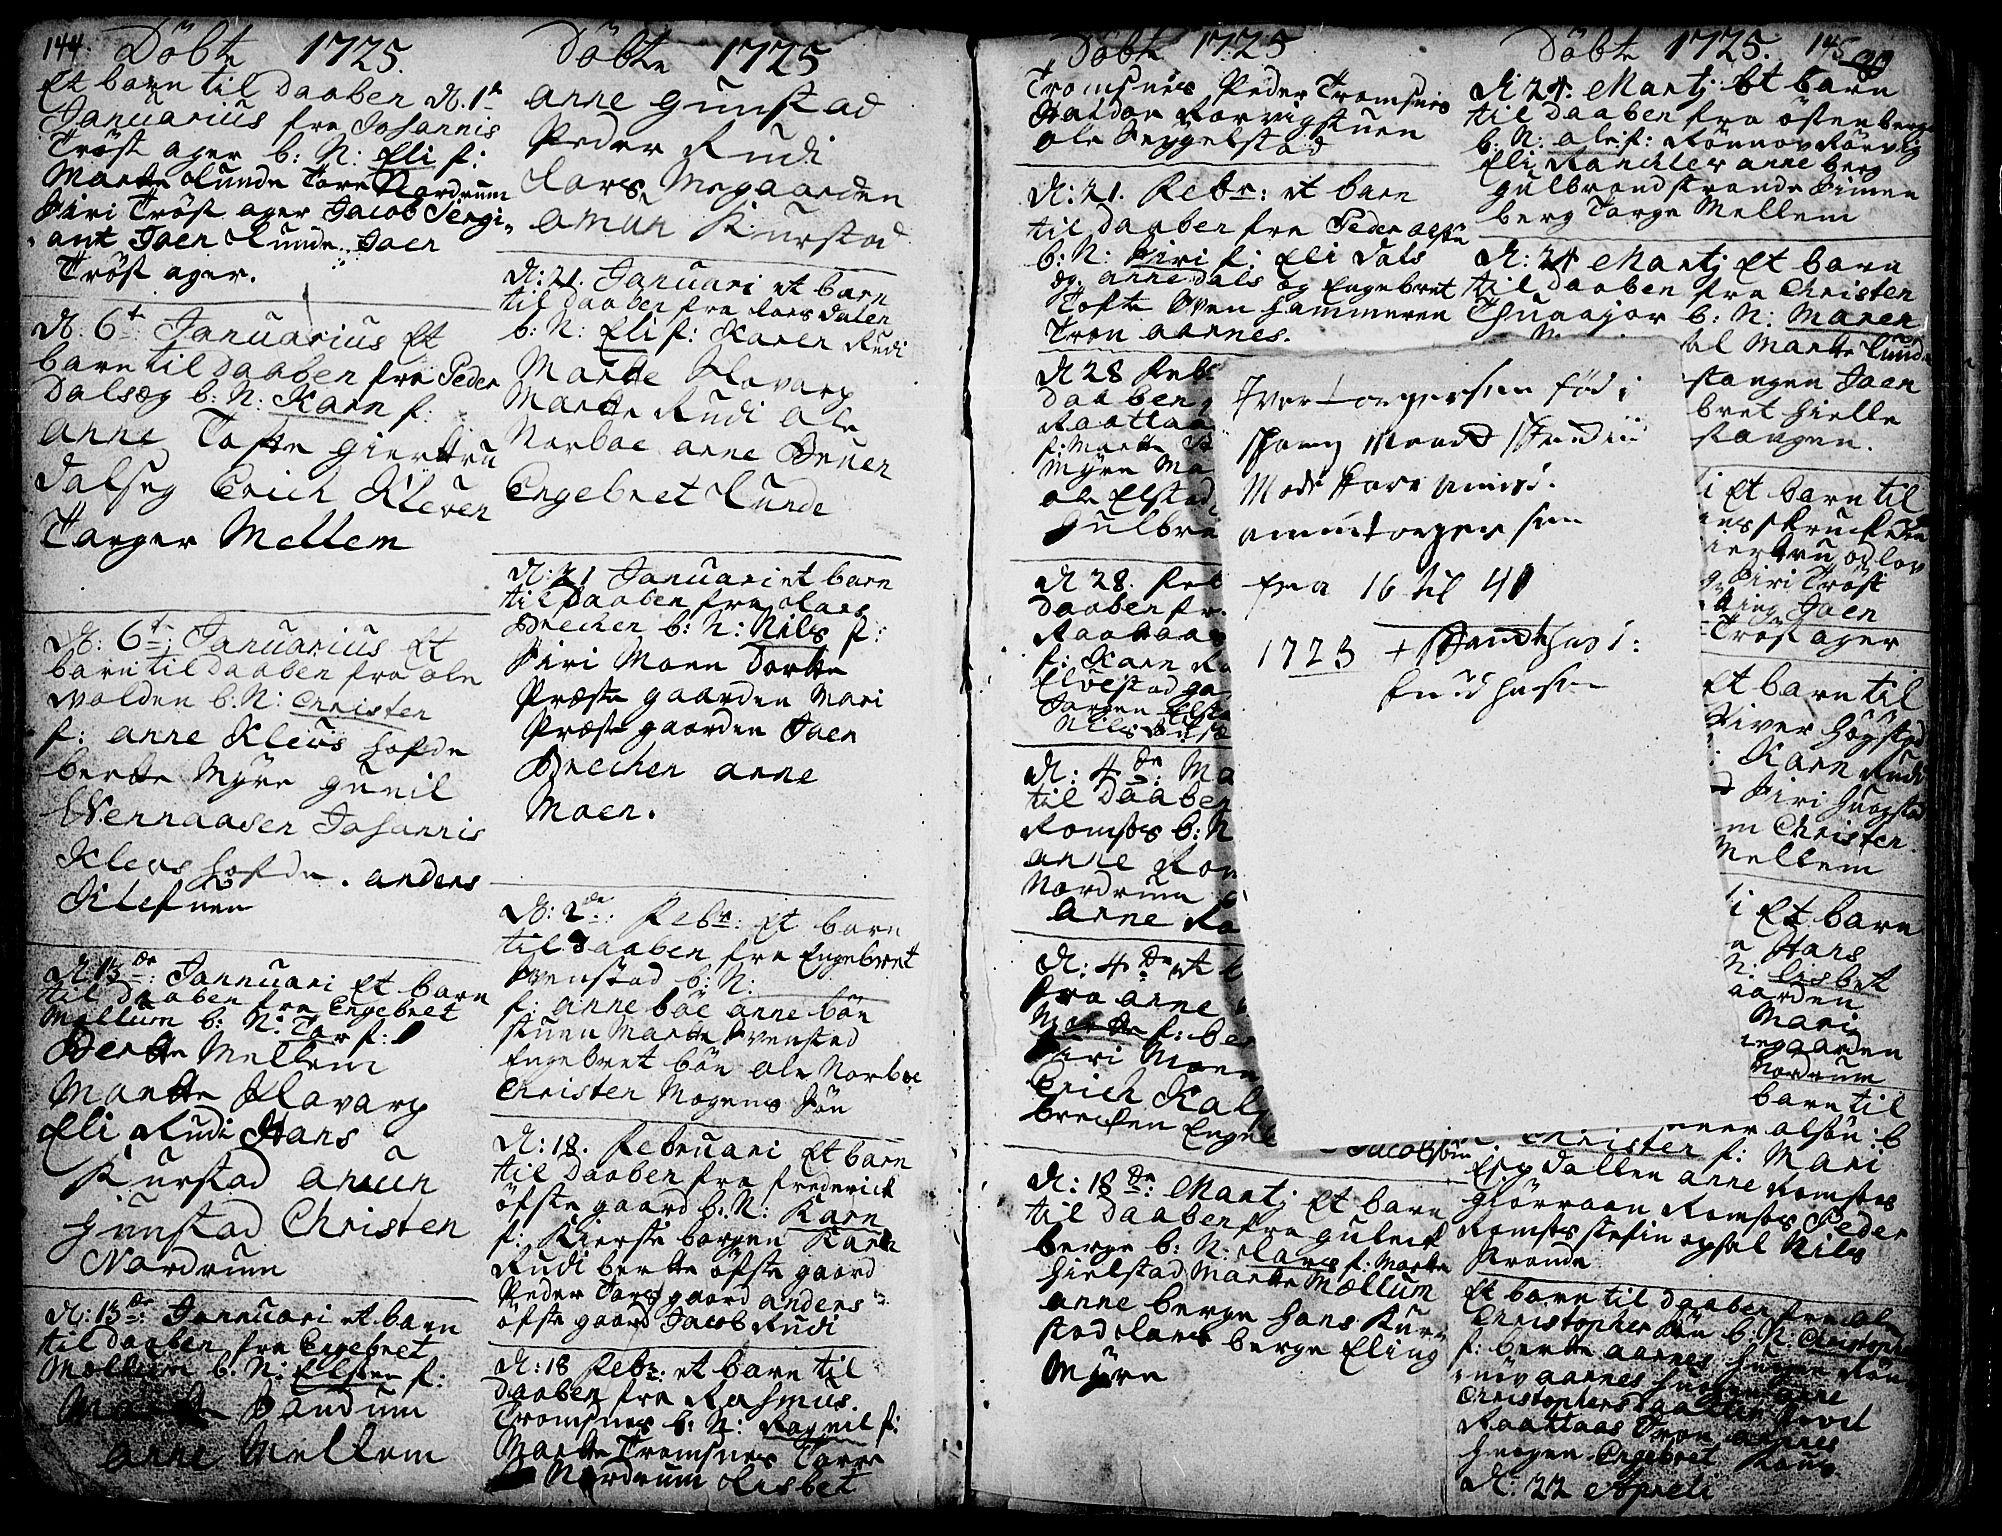 SAH, Ringebu prestekontor, Ministerialbok nr. 1, 1696-1733, s. 144-145